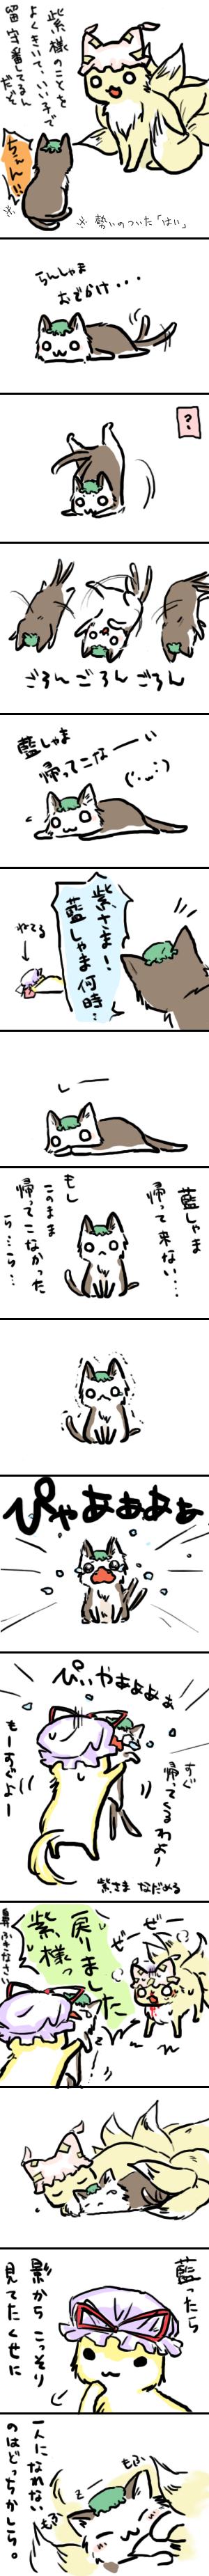 chen, chen, yakumo ran, yakumo ran, and yakumo yukari (touhou) drawn by si-ma